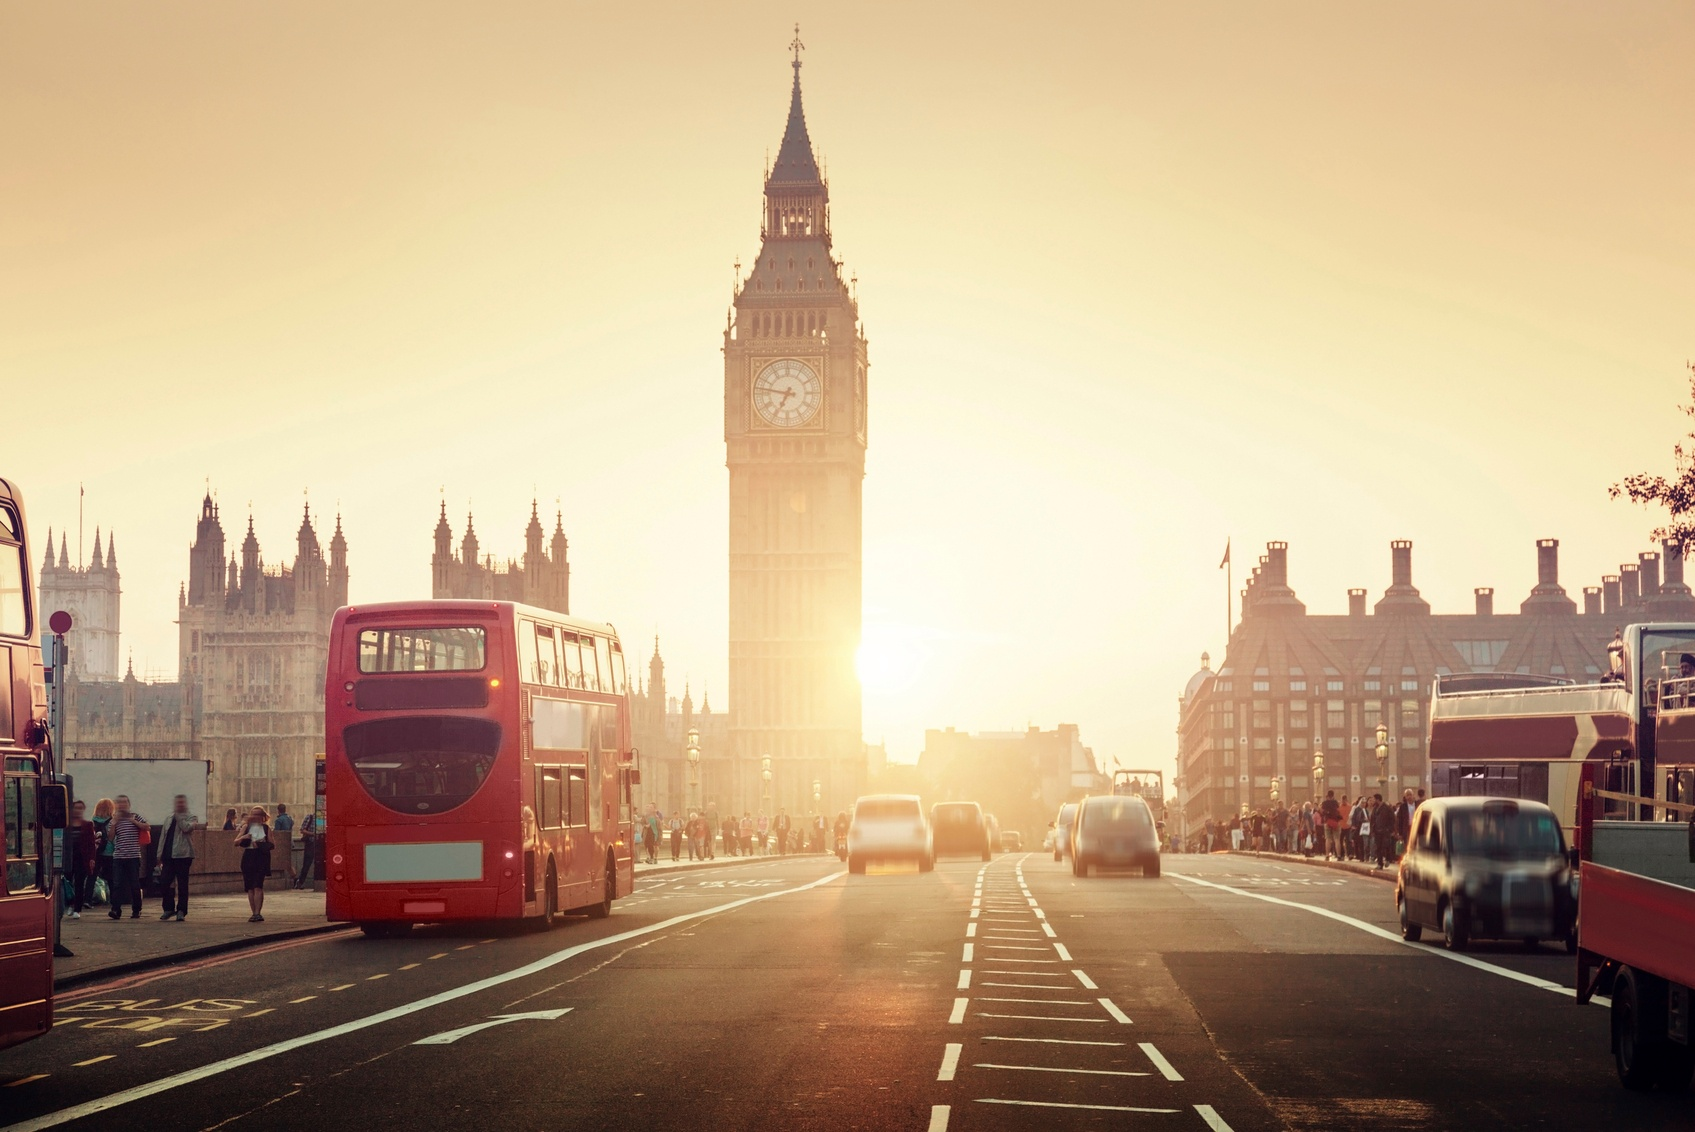 Westminster-Bridge-at-sunset-London-UK-000089217233_Medium.jpg